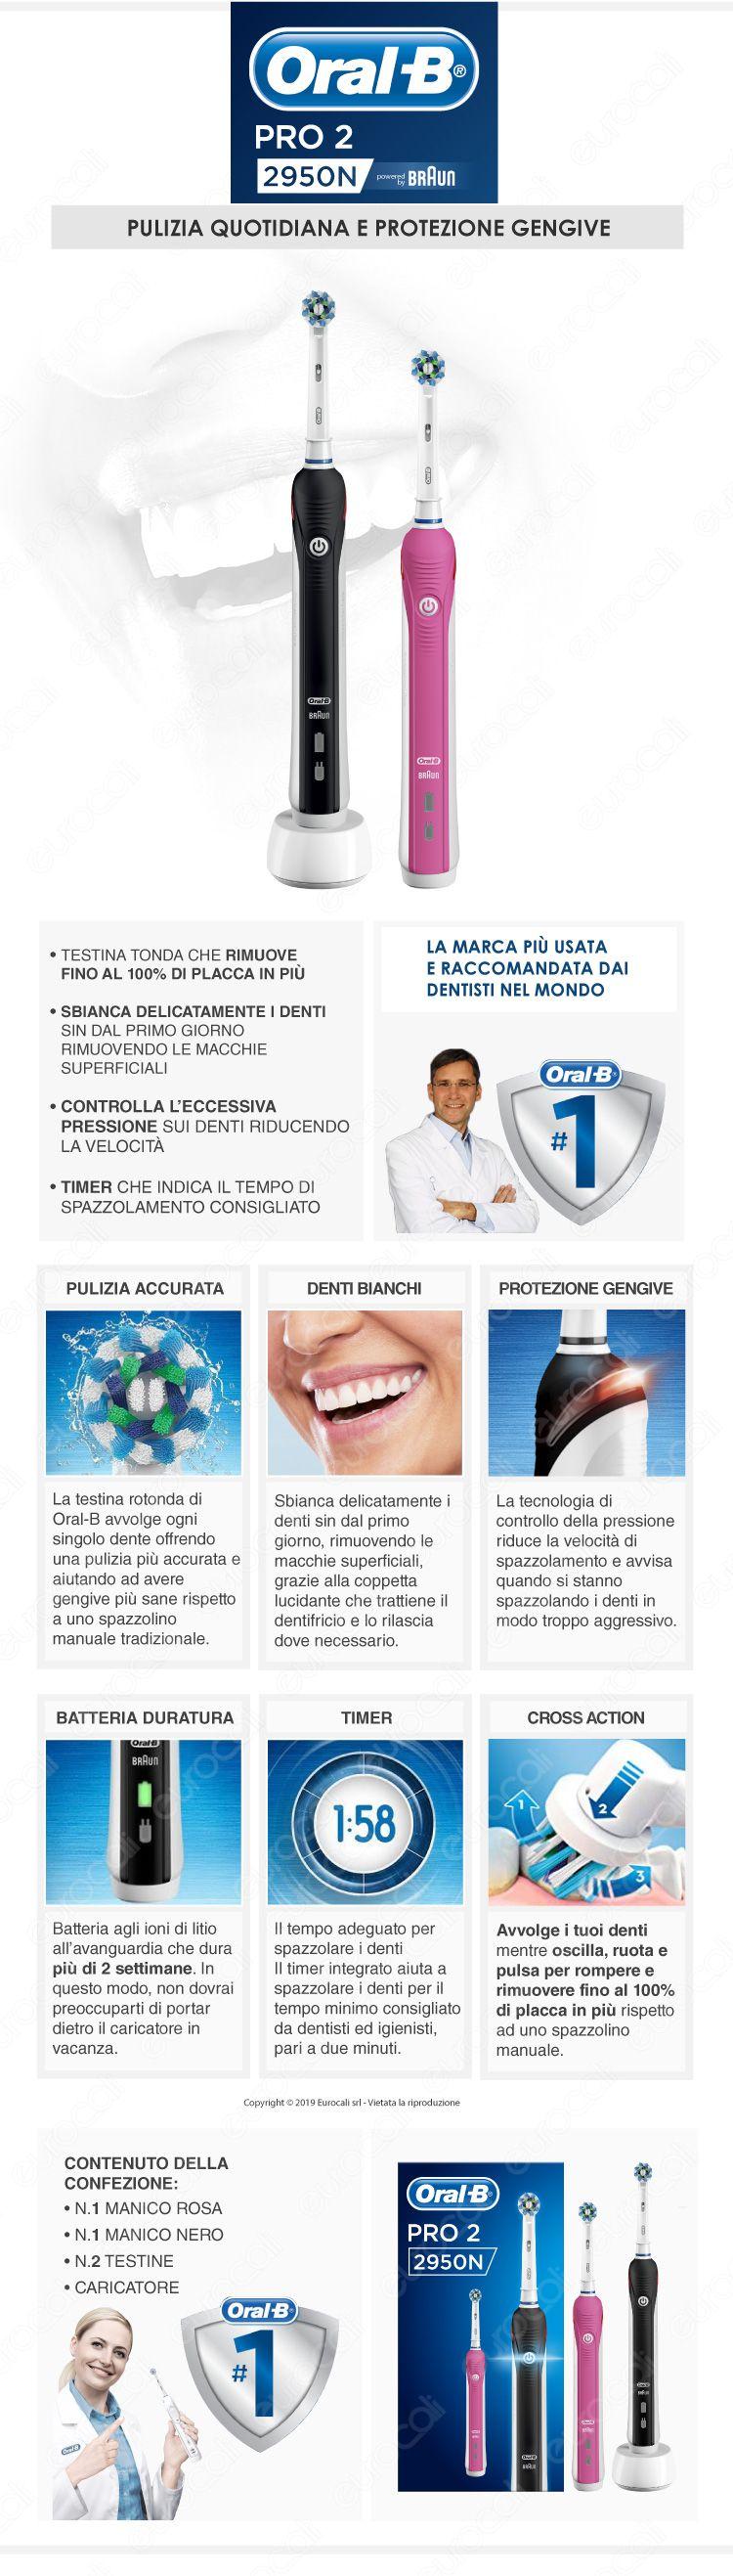 Oral-B Spazzolino Elettrico PRO2 2950N